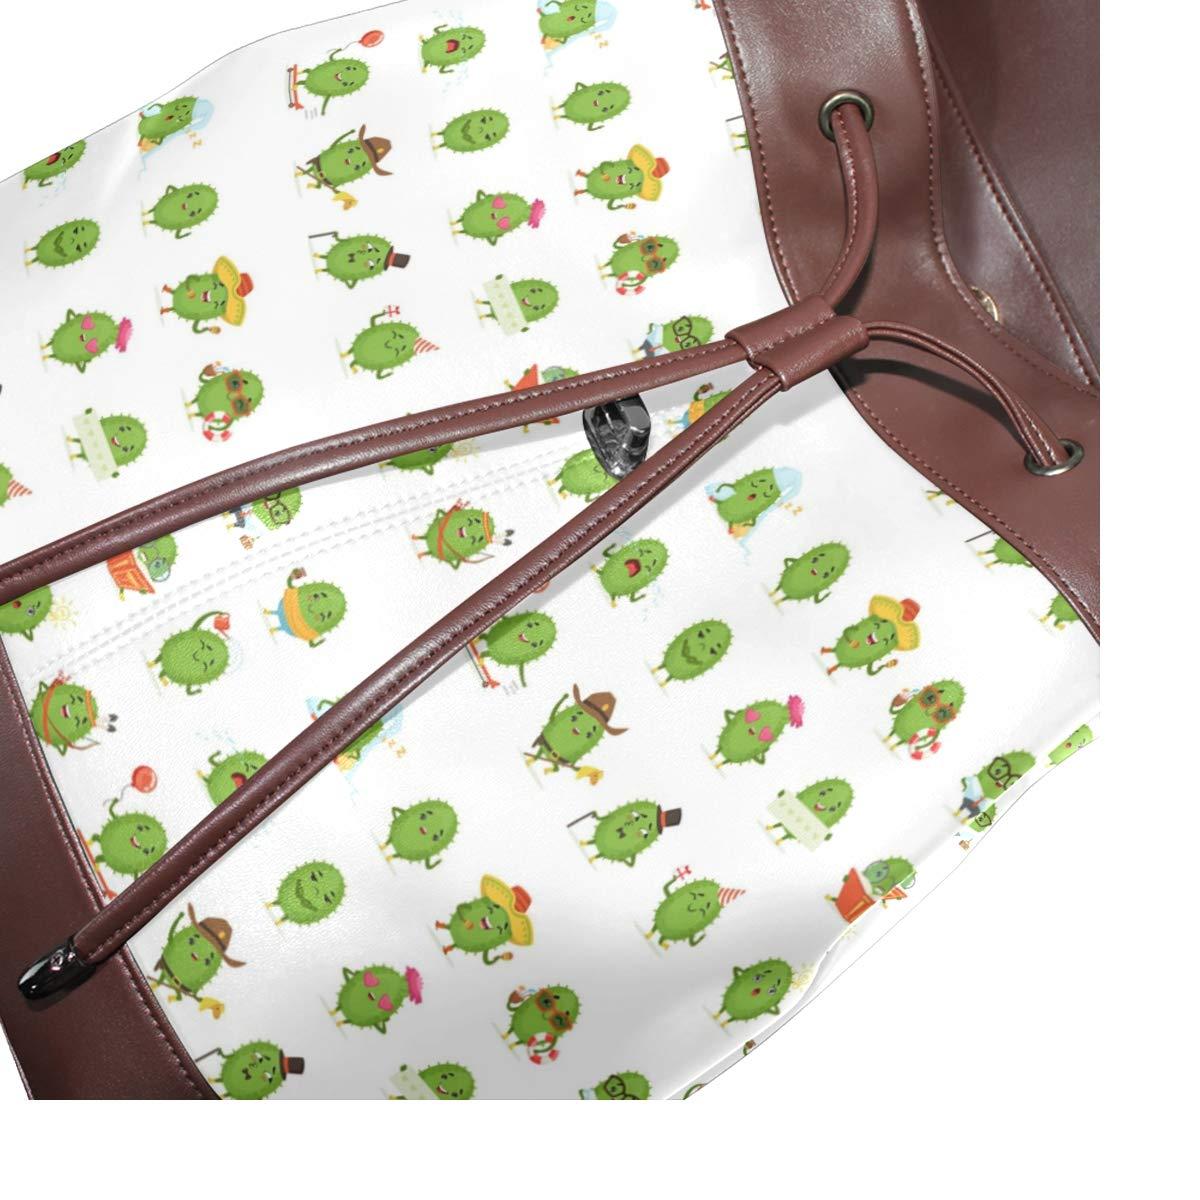 Leather Cute Cactus Cartoon Characters Backpack Daypack Bag Women